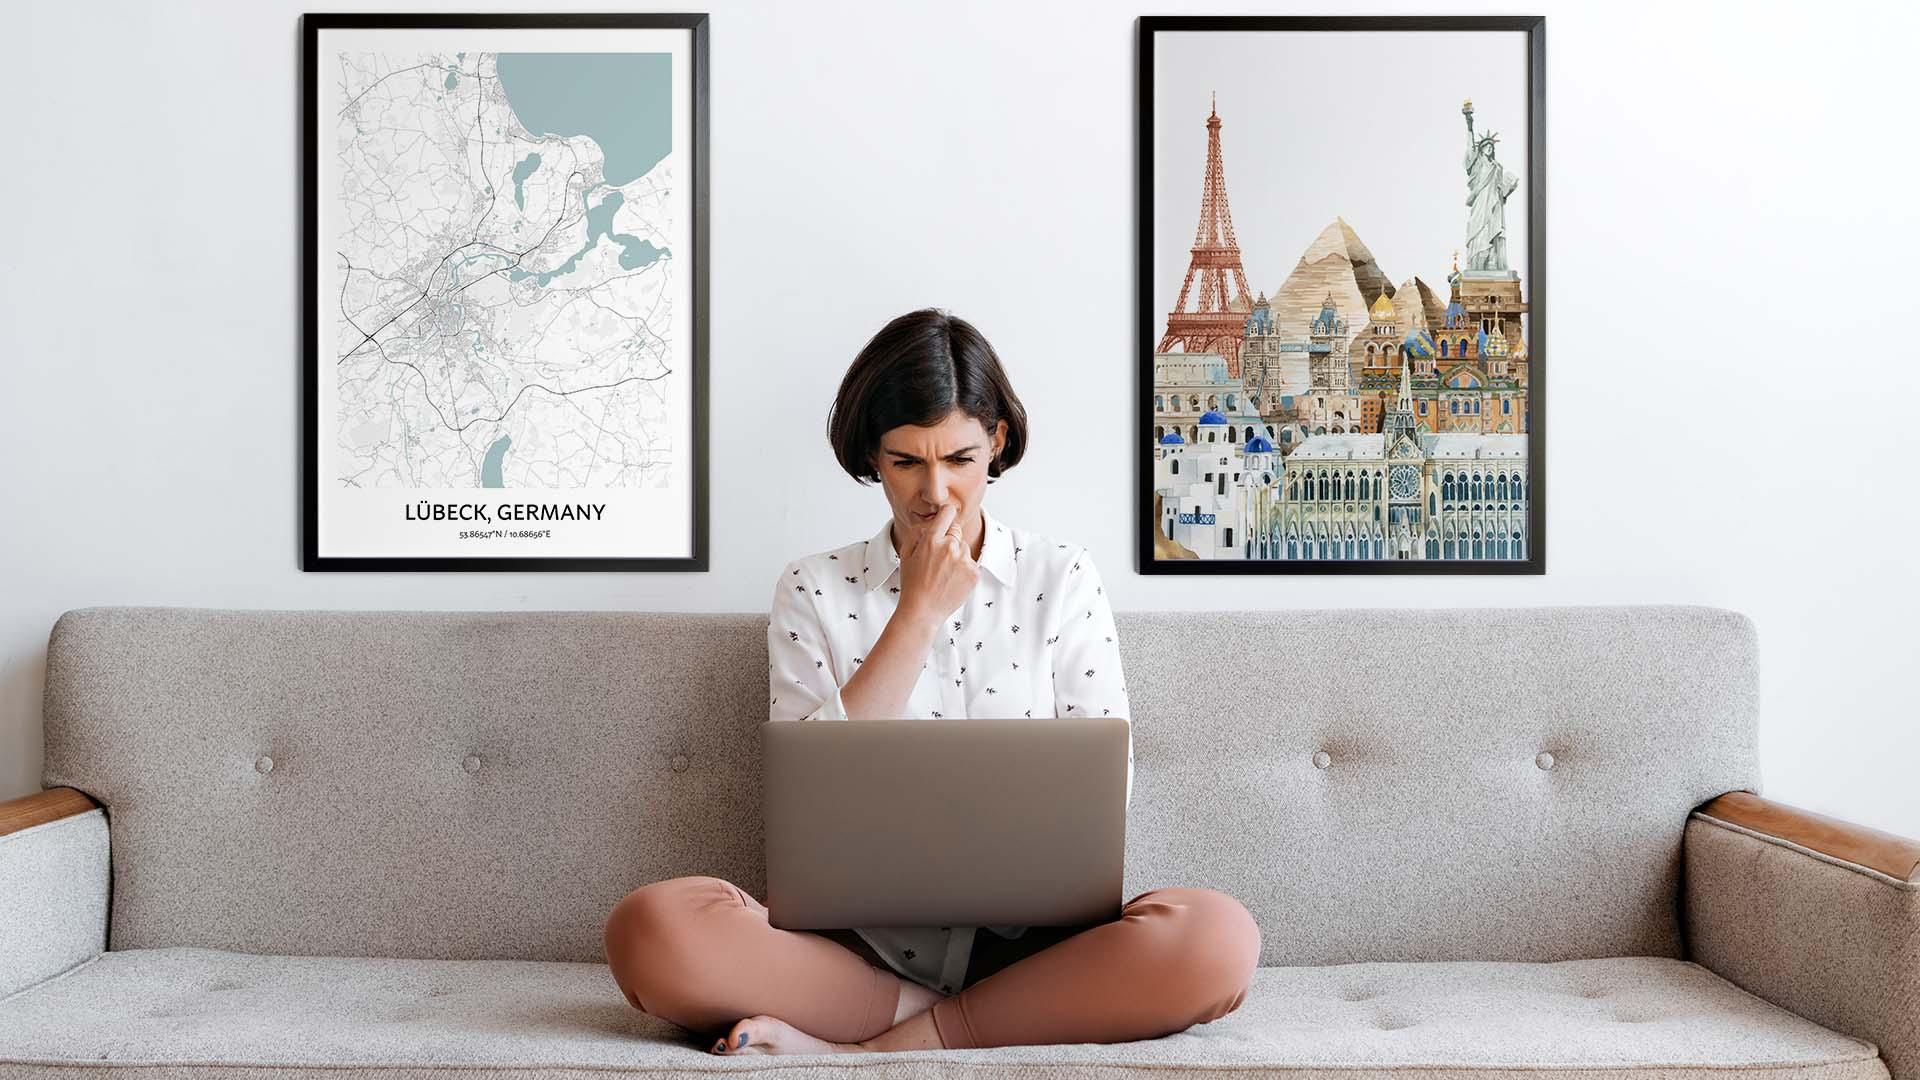 Lubeck city map art